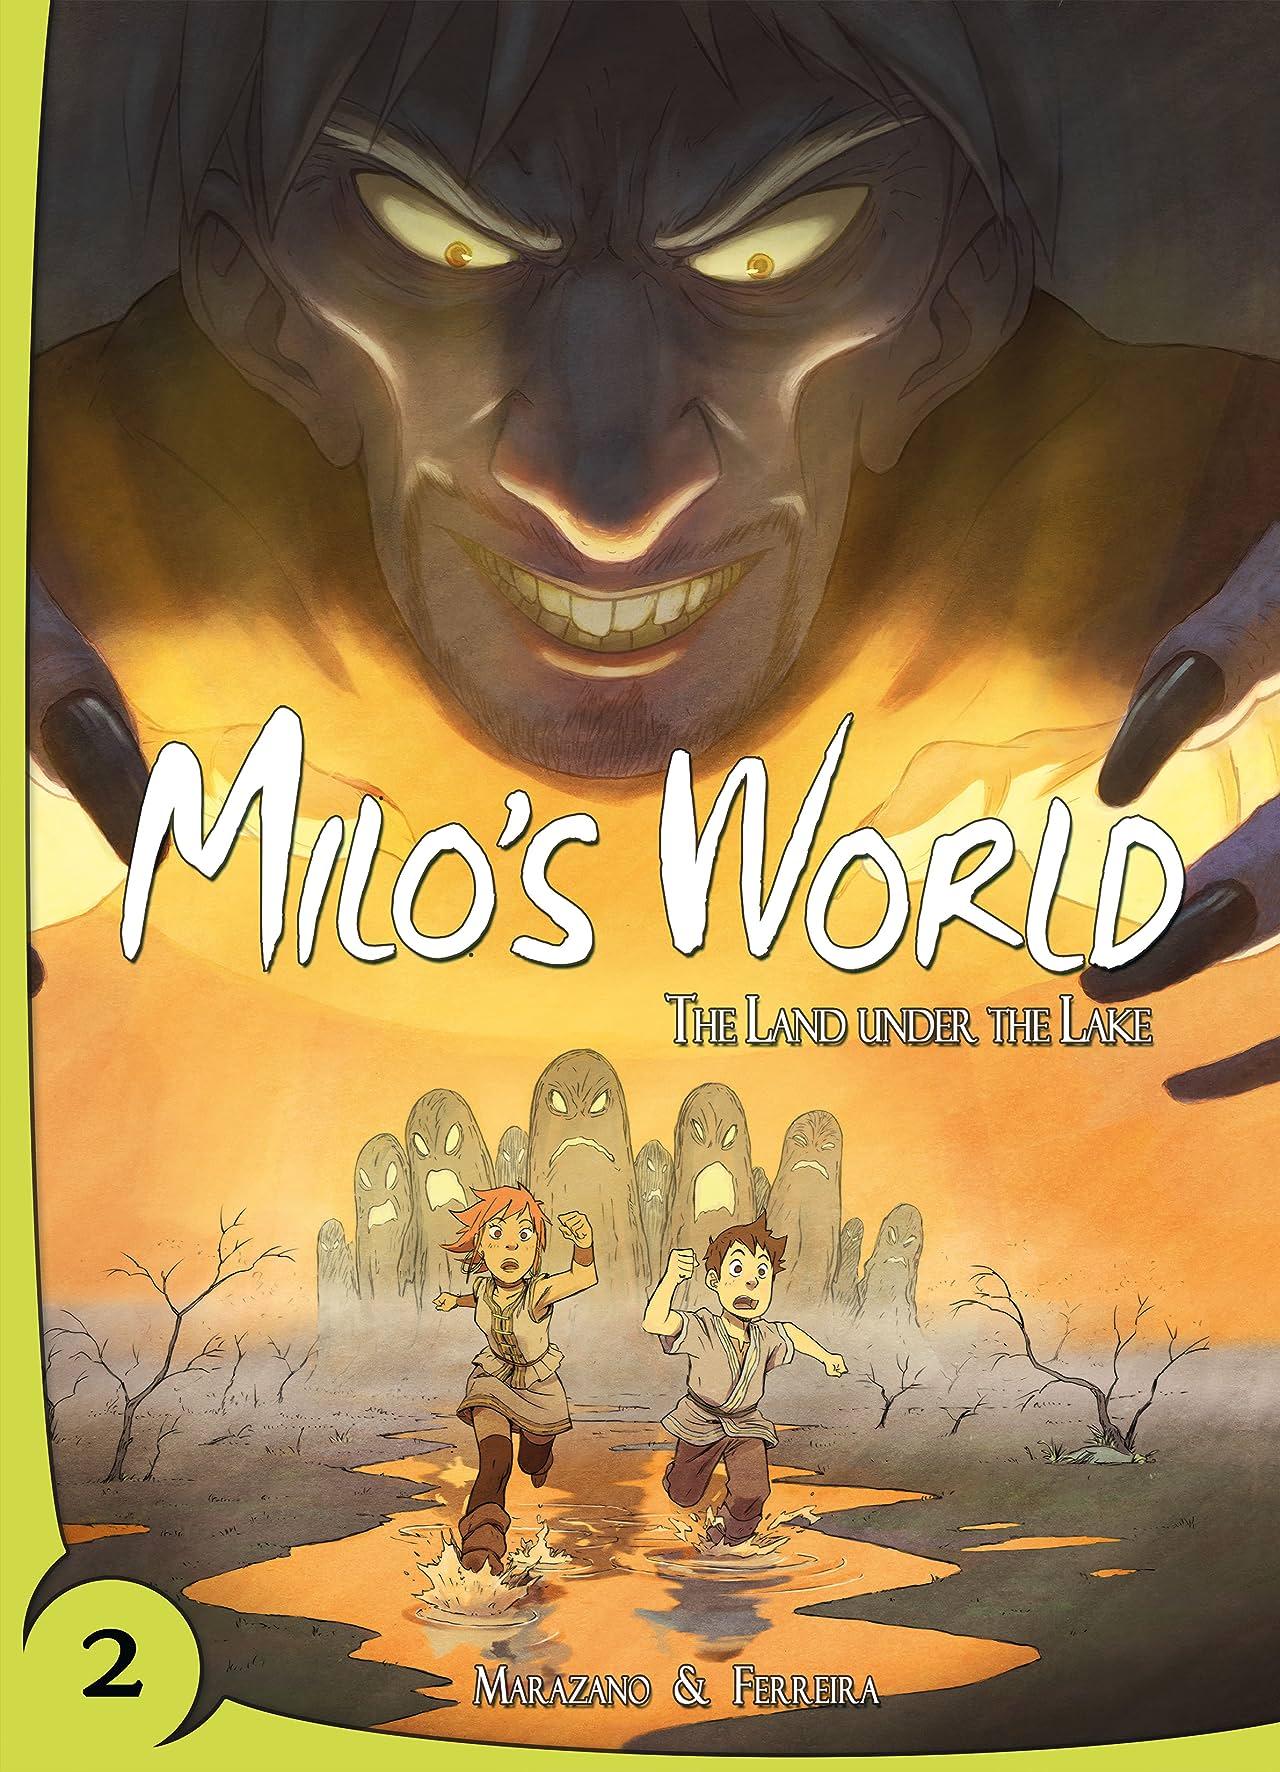 Milo's World Vol. 1 #2: The Land under the Lake